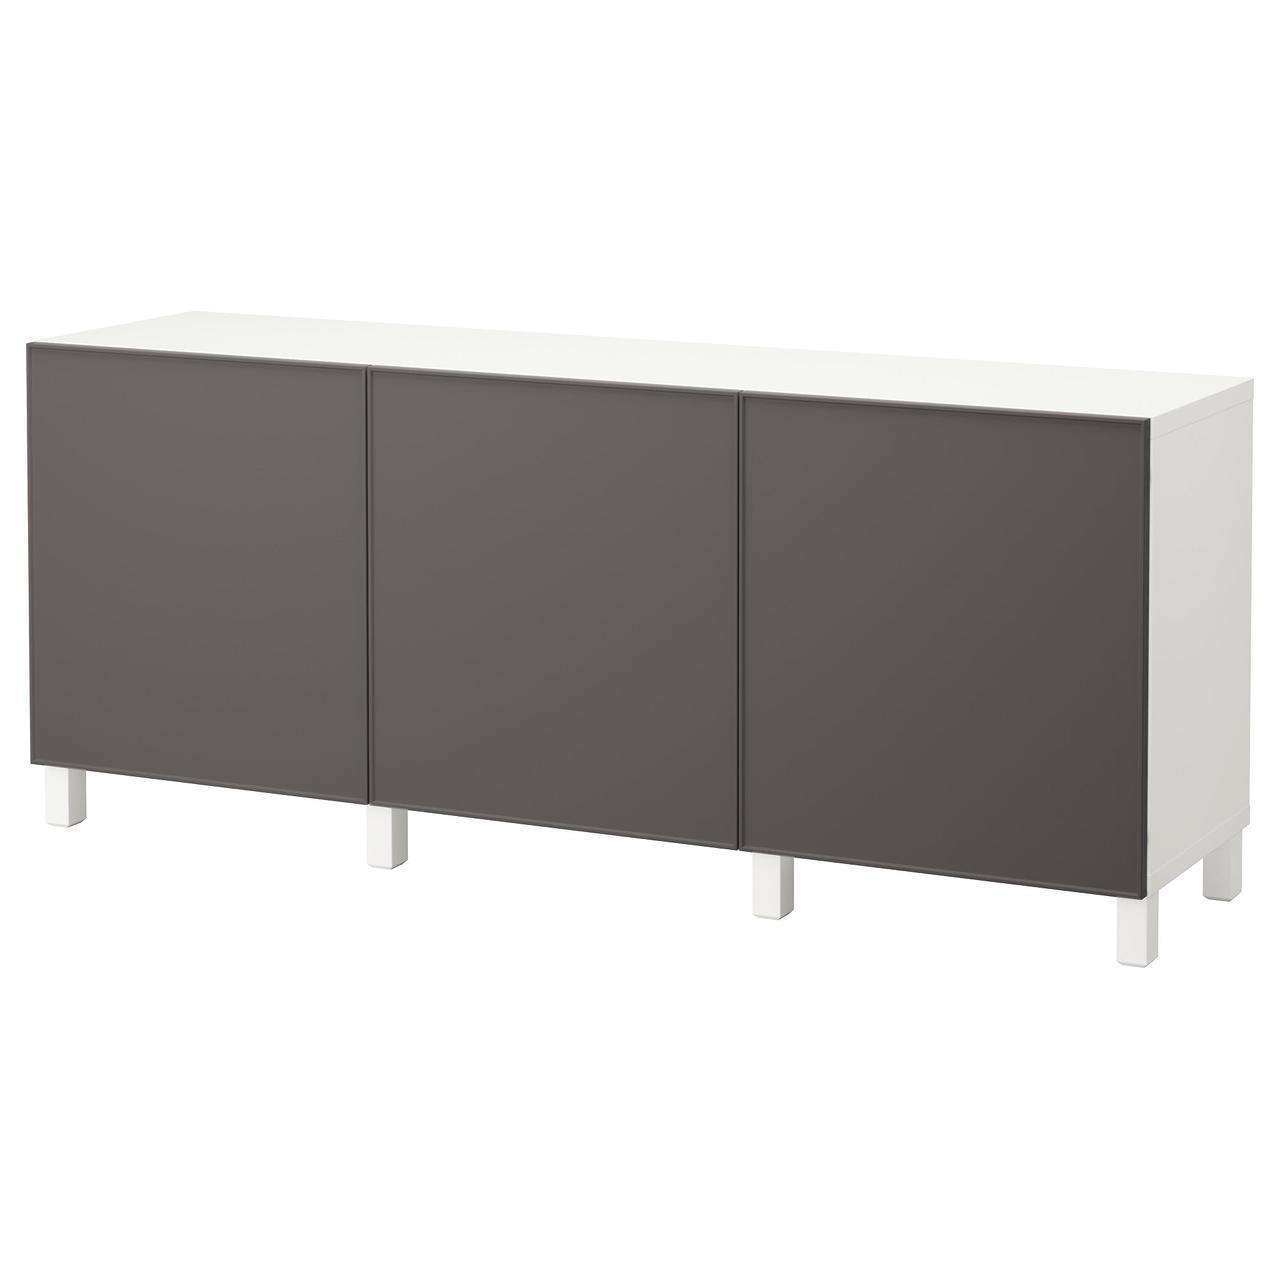 IKEA BESTA (492.059.72) Сервант/буфет